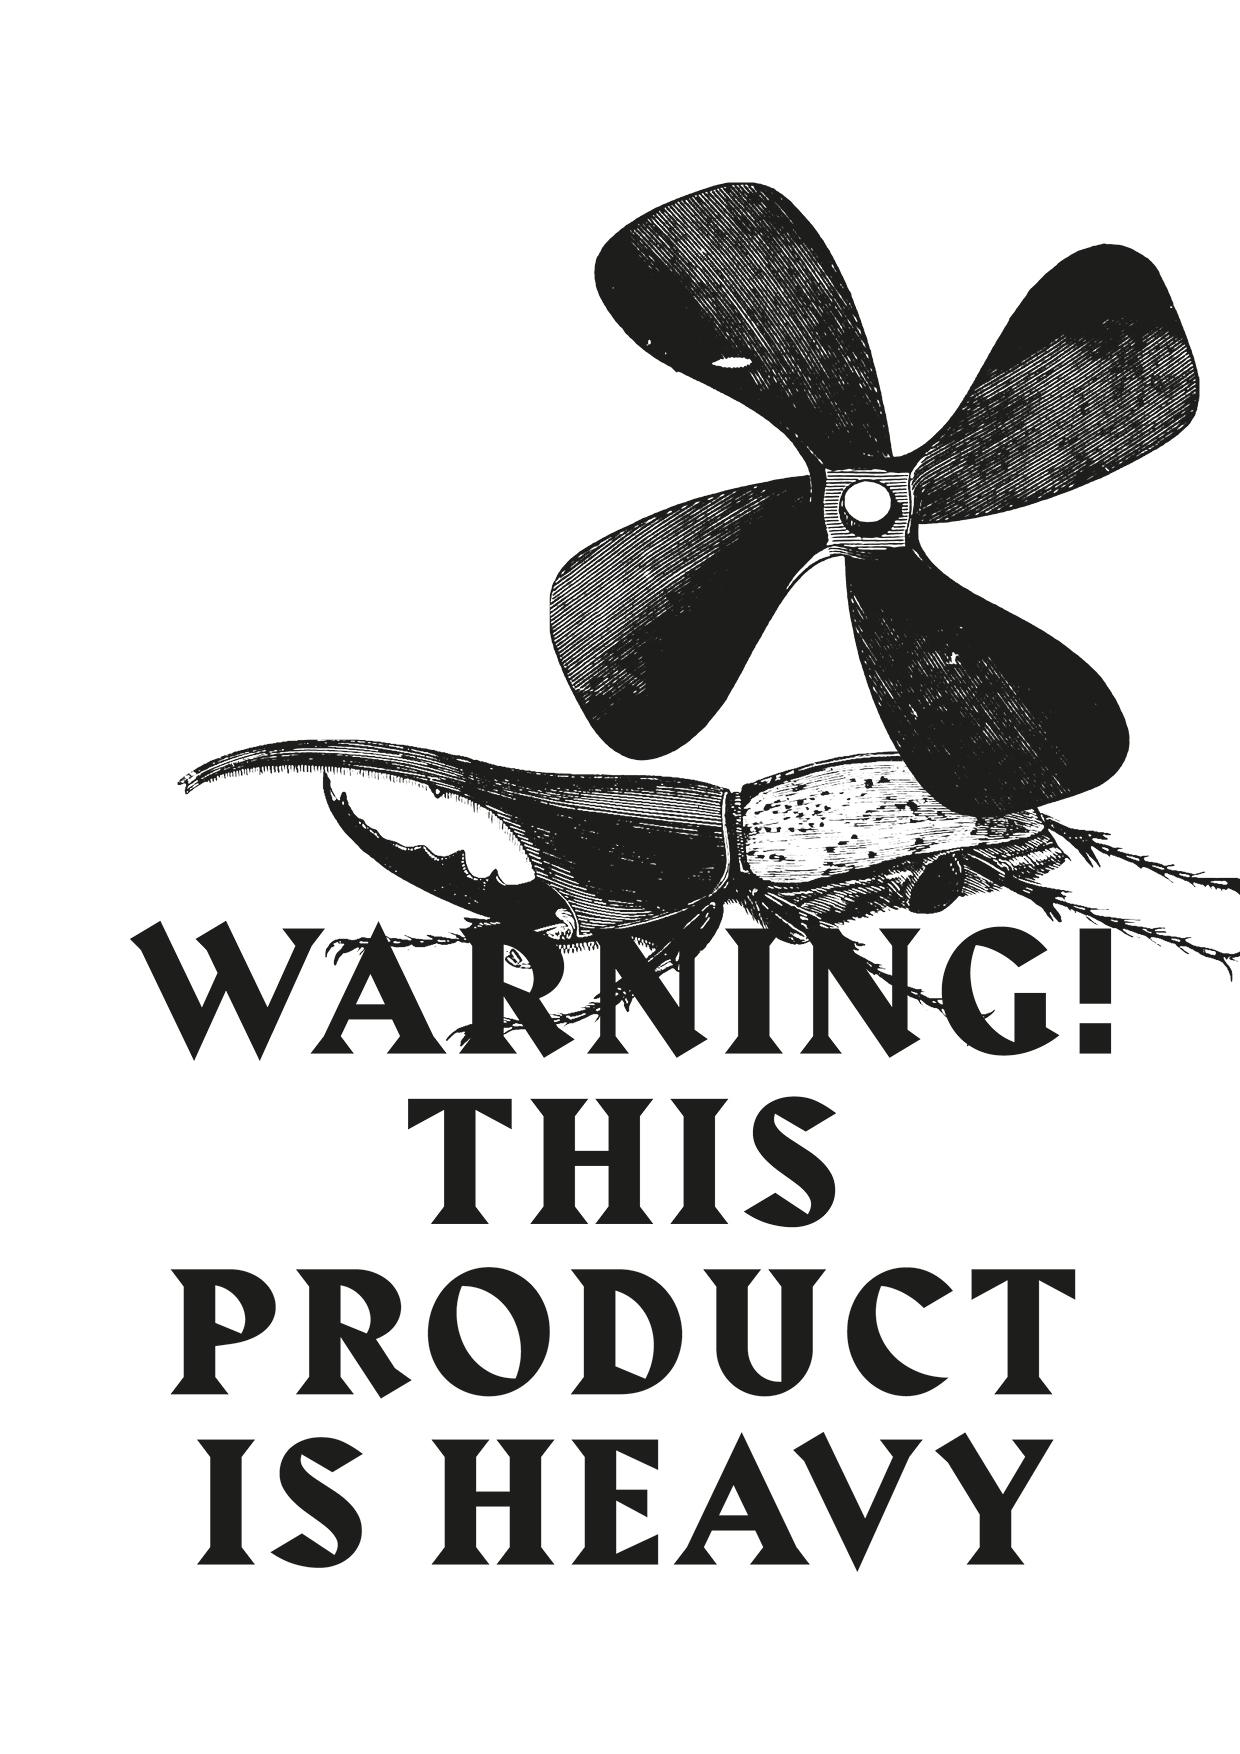 Unsubscribe-print-typography-design-James-Lee-Duffy4.jpg